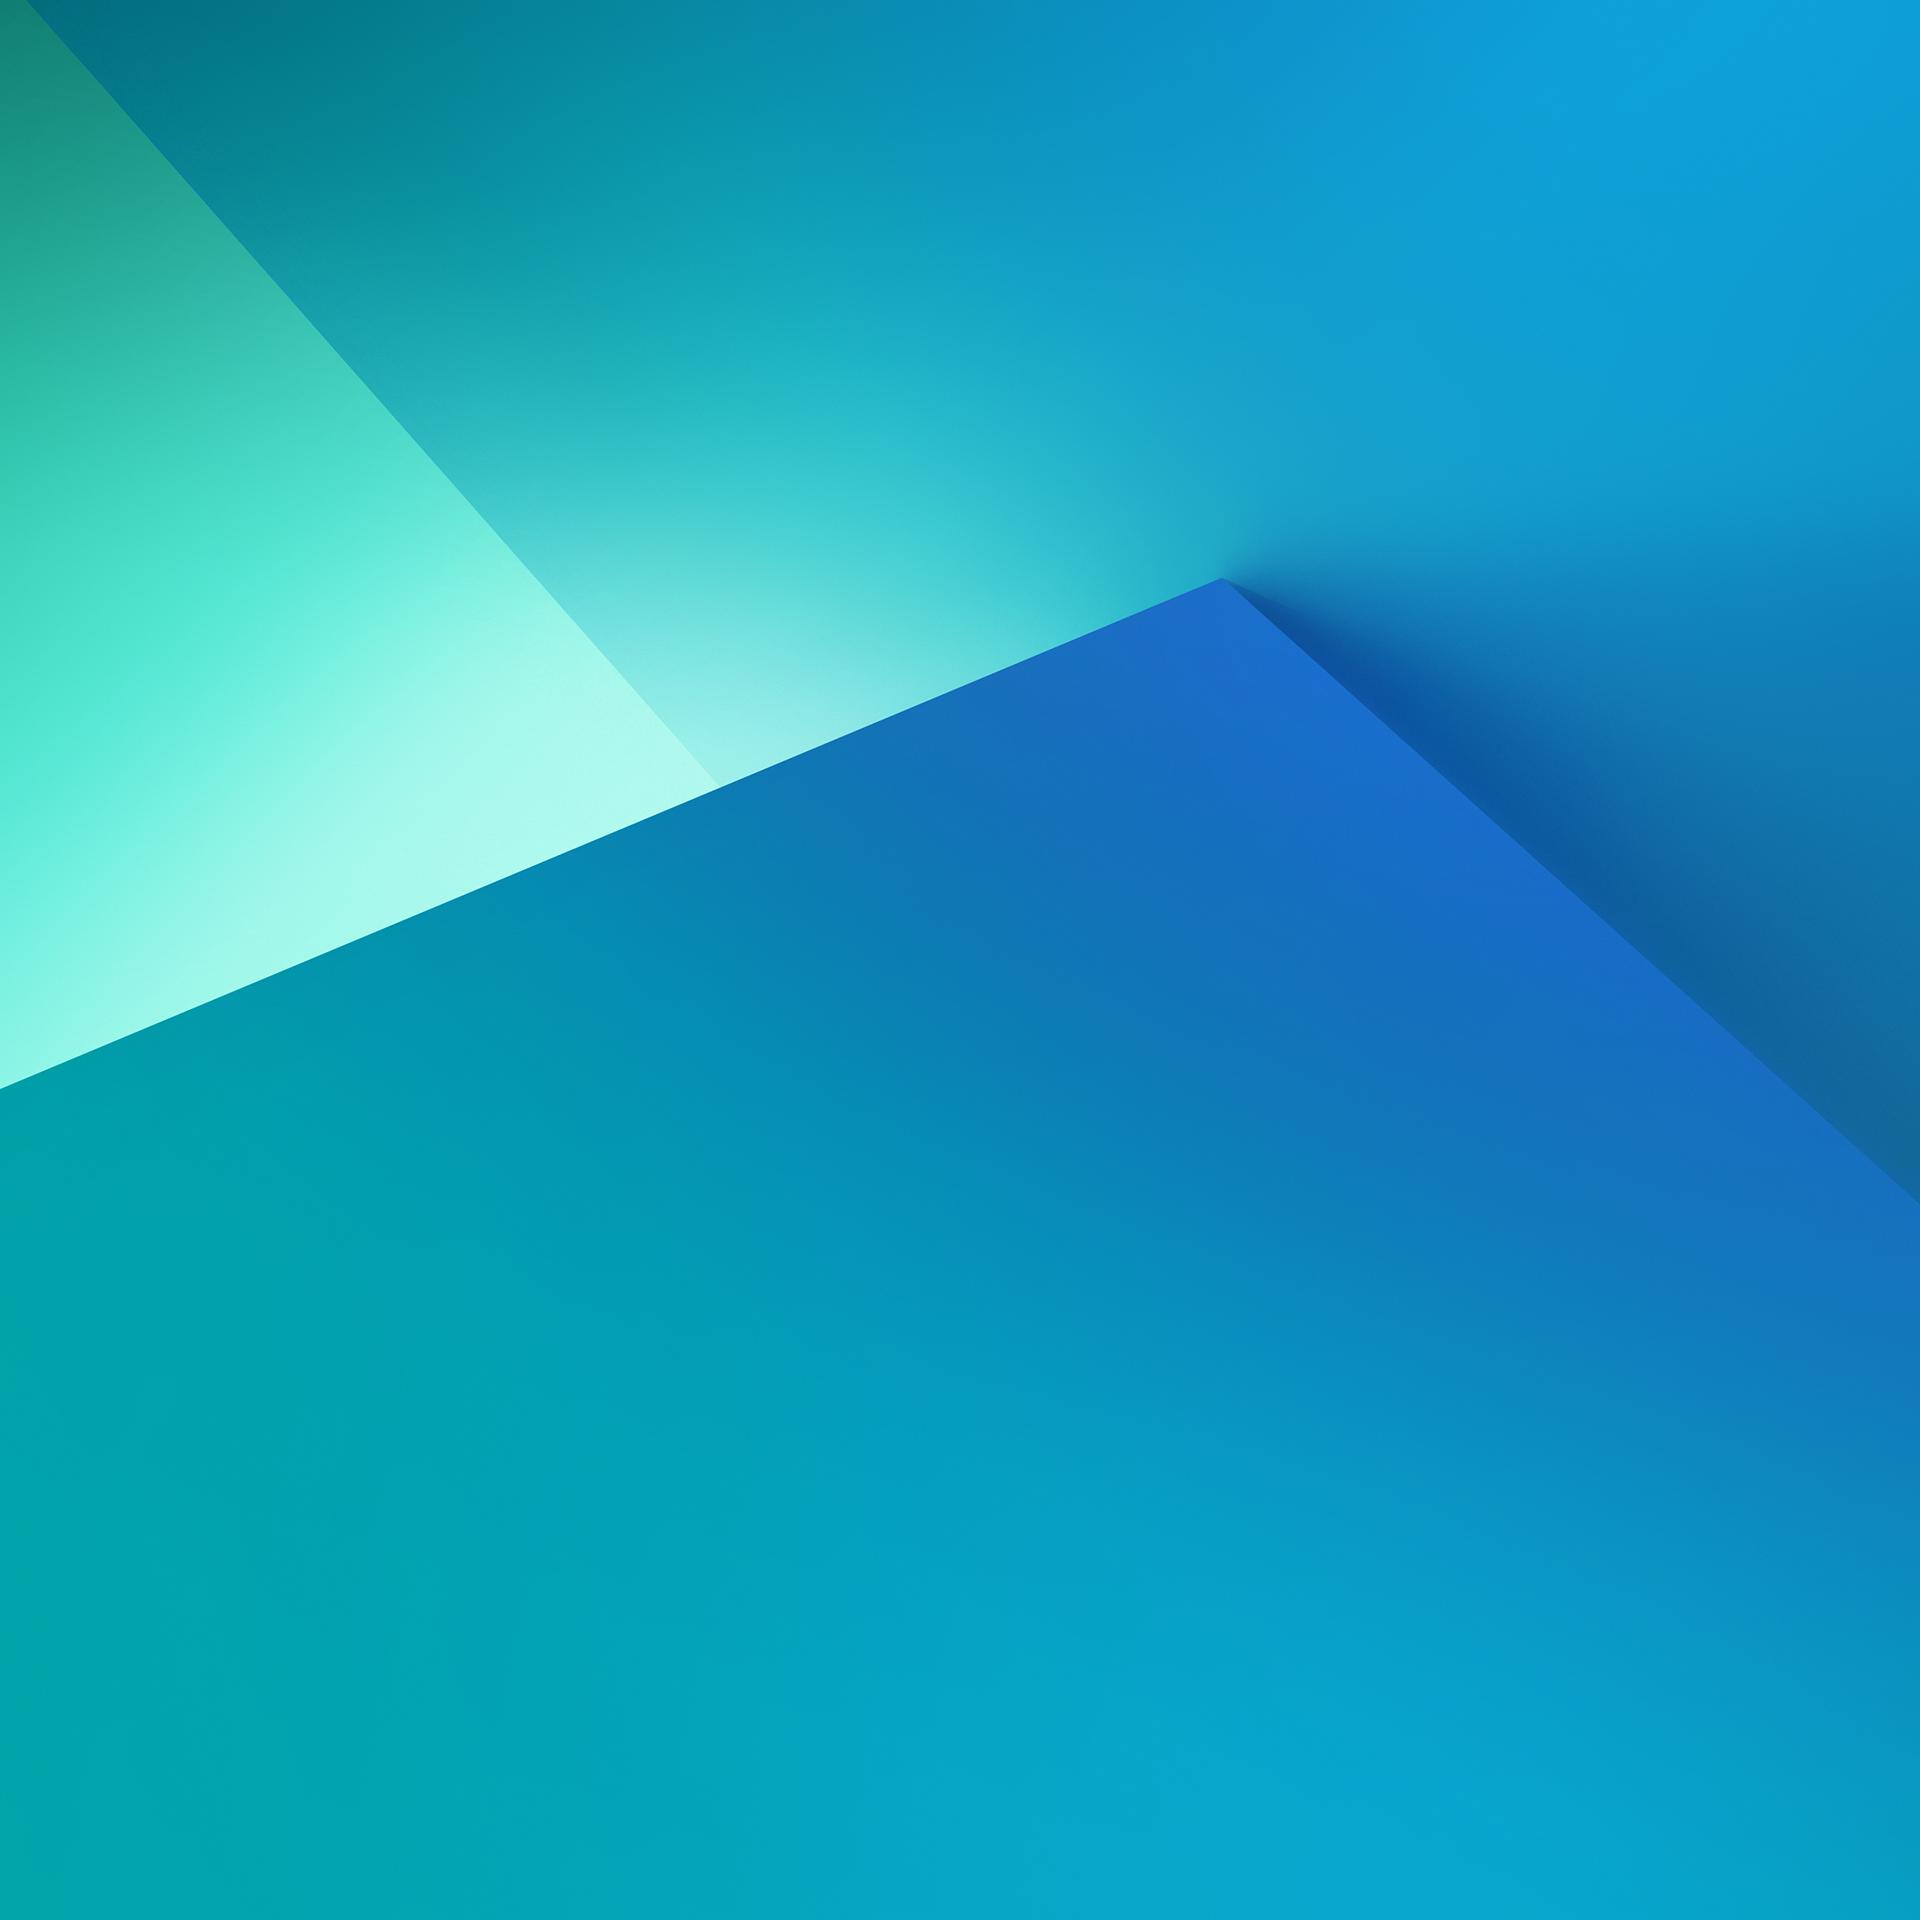 Download Samsung Galaxy C5 Pro Wallpaper